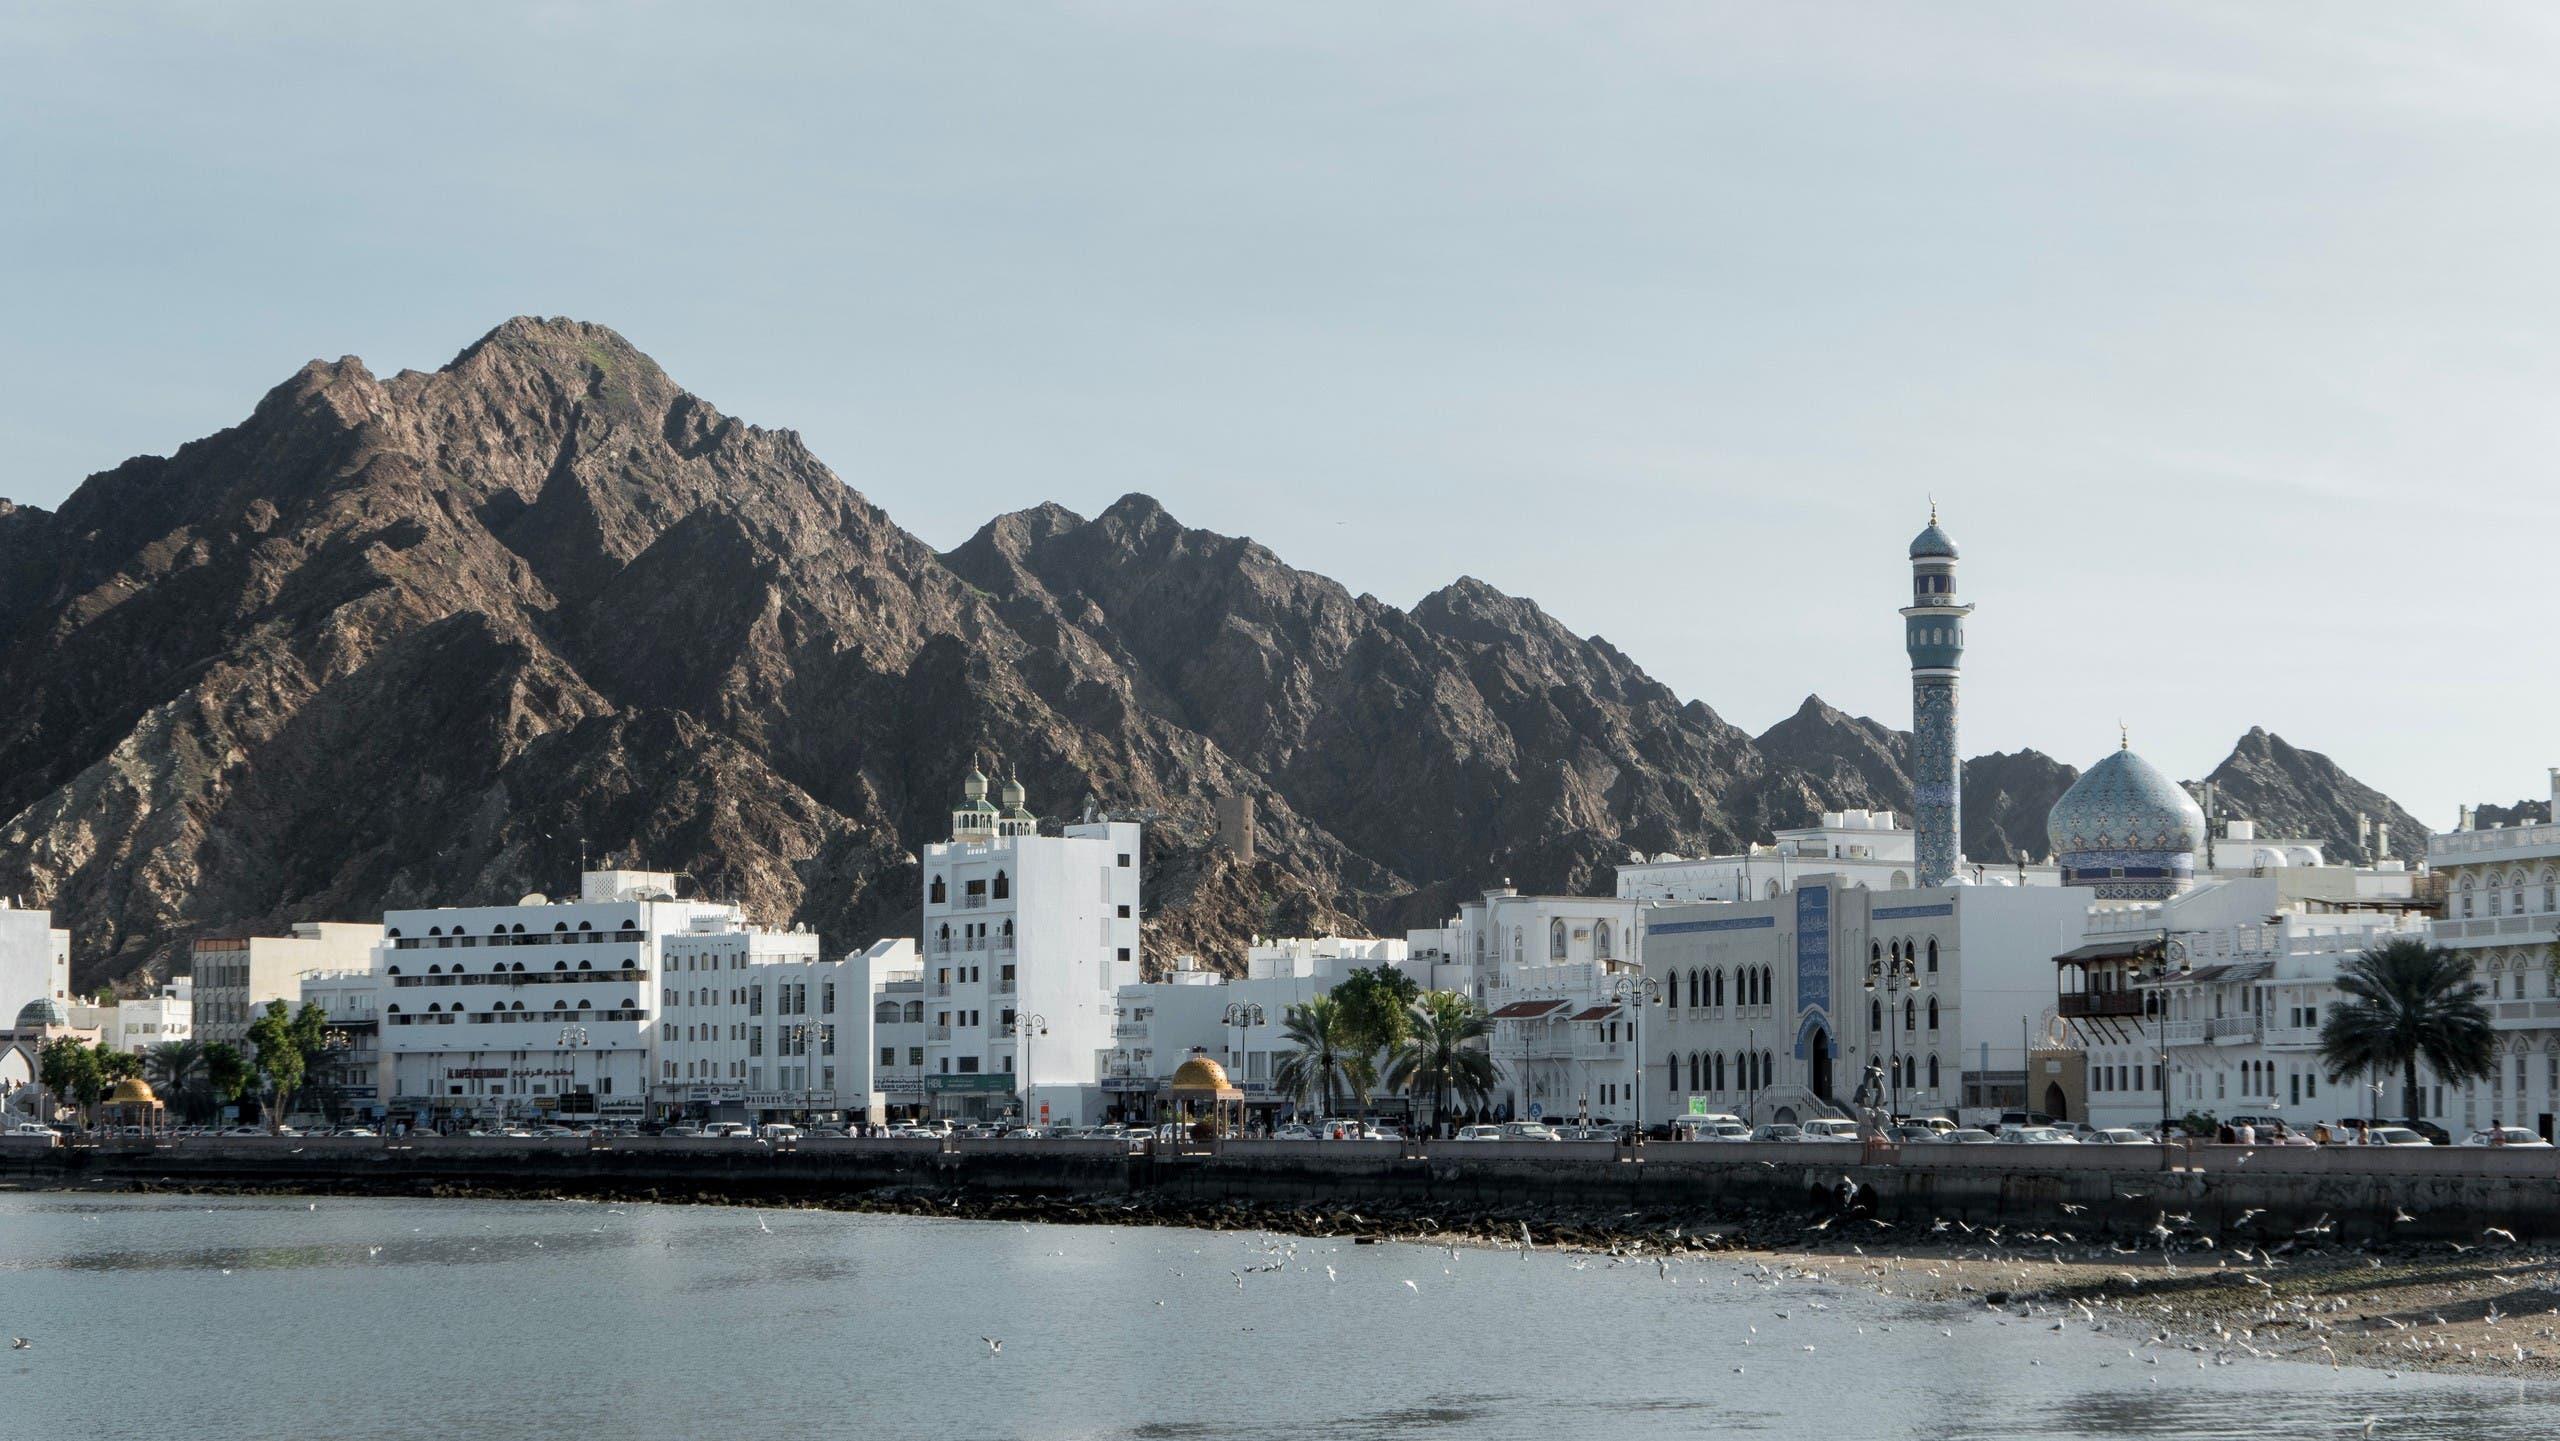 A general view of Muscat, Oman. (Arisa. S, Unsplash)